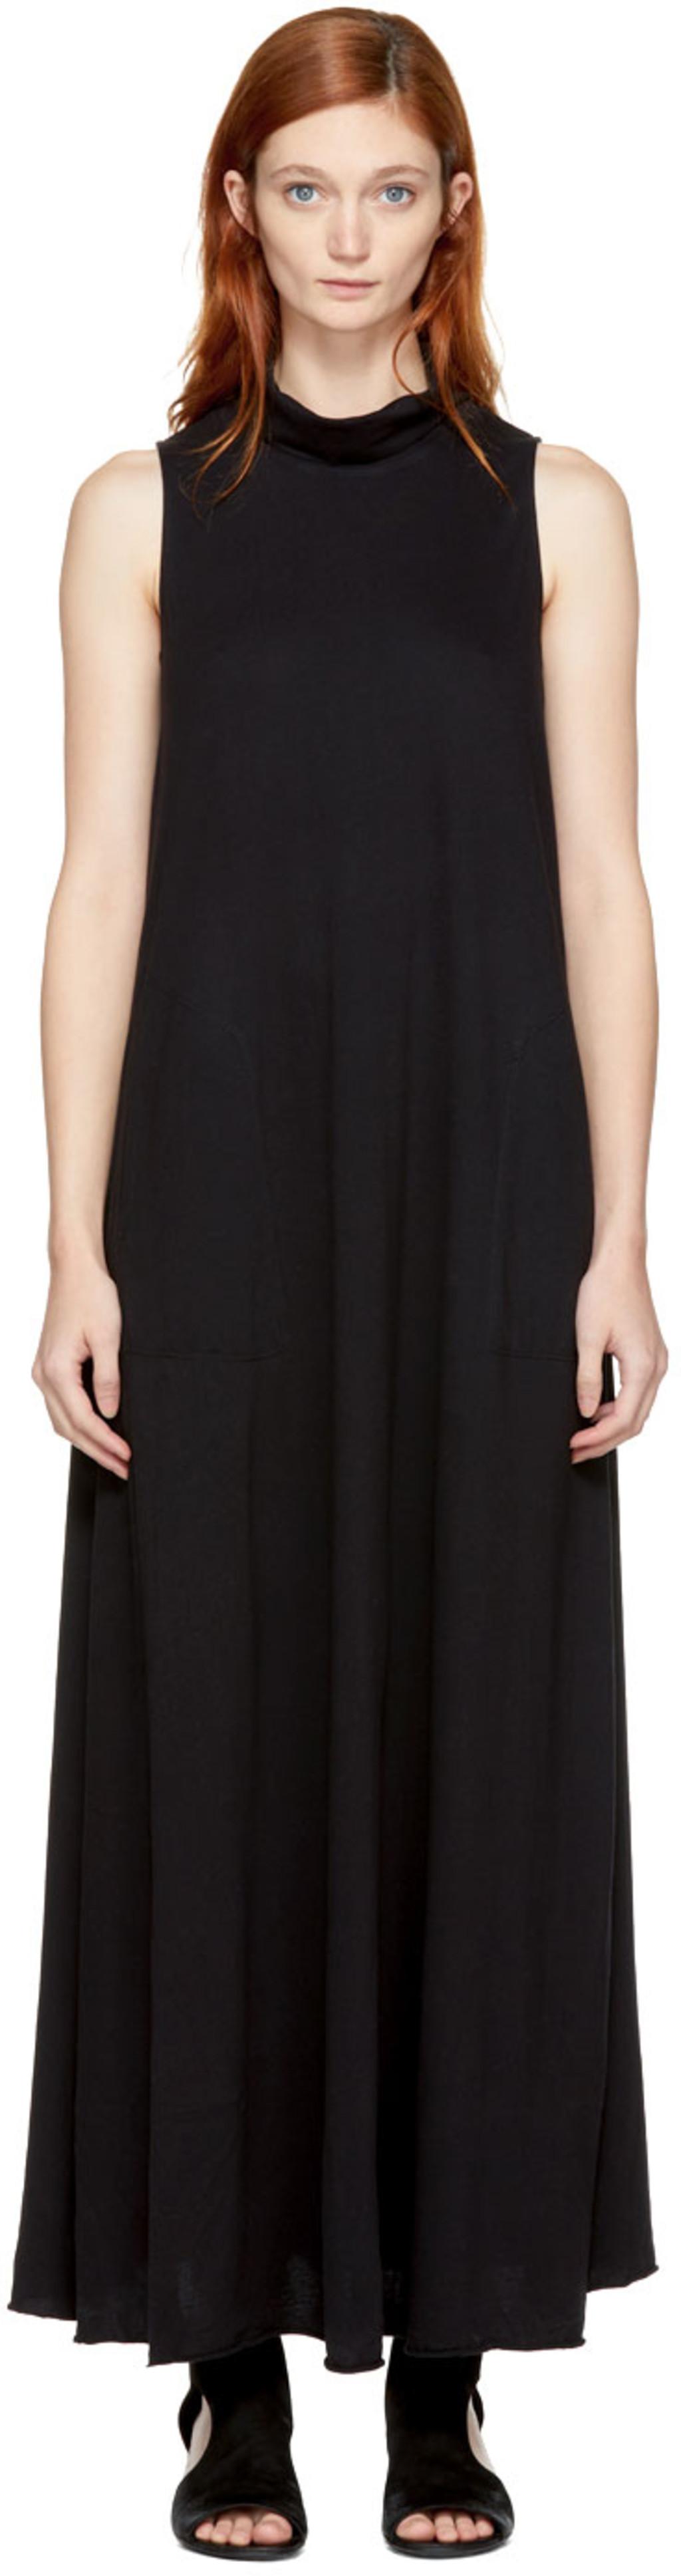 Ivory Long Turtleneck Dress Raquel Allegra